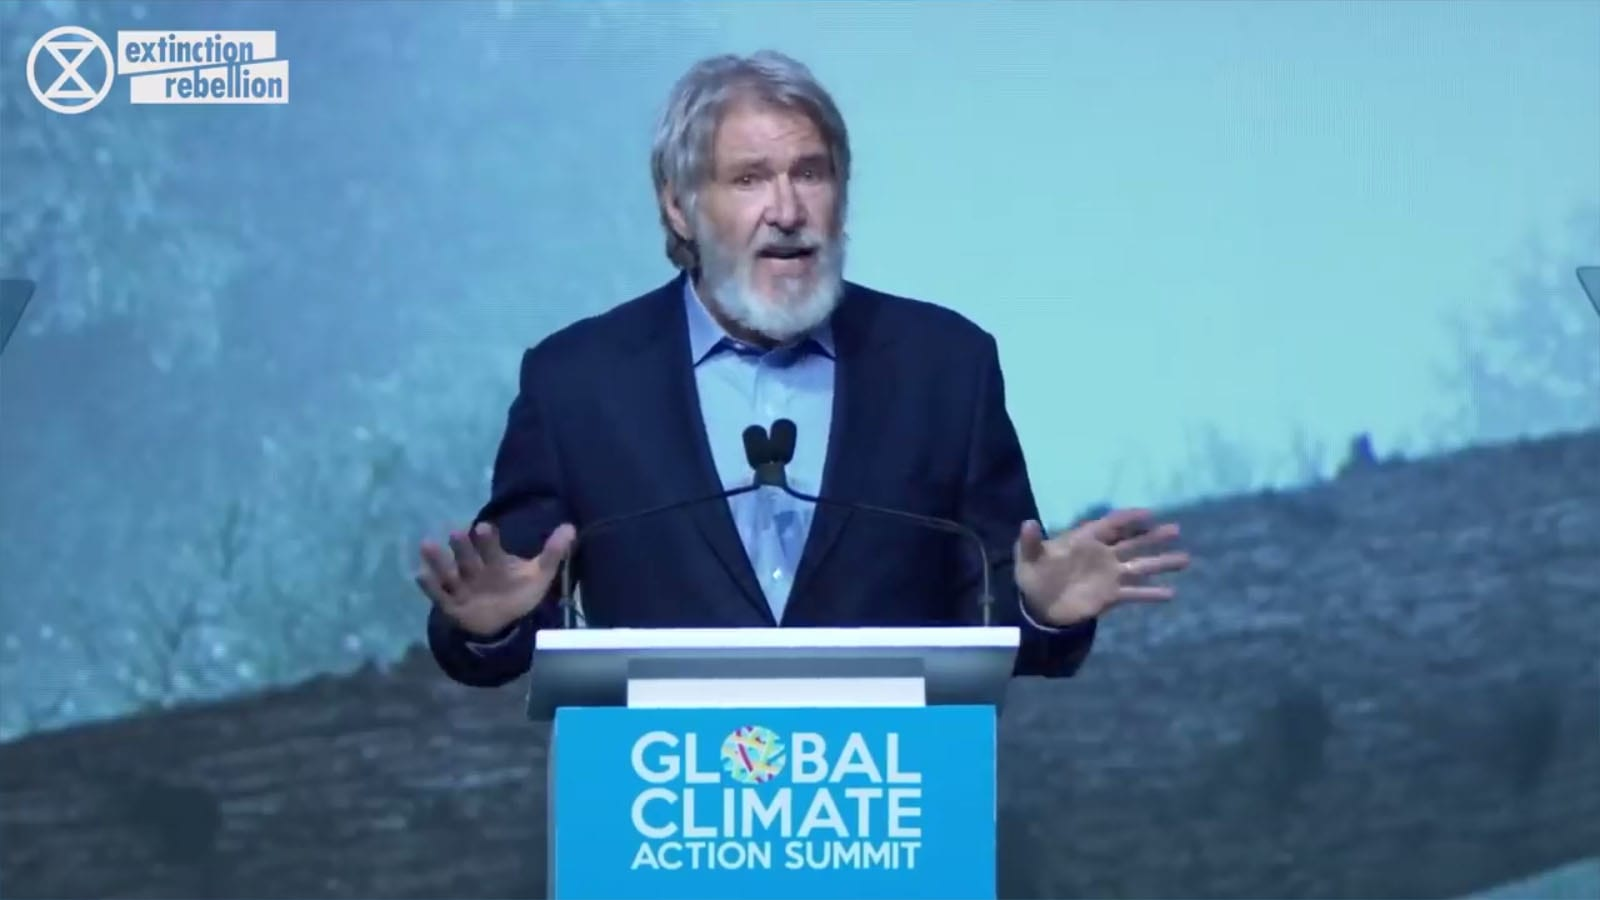 """Ha nem tudjuk megóvni a természetet, nem tudjuk megóvni magunkat"" – Harrison Ford"